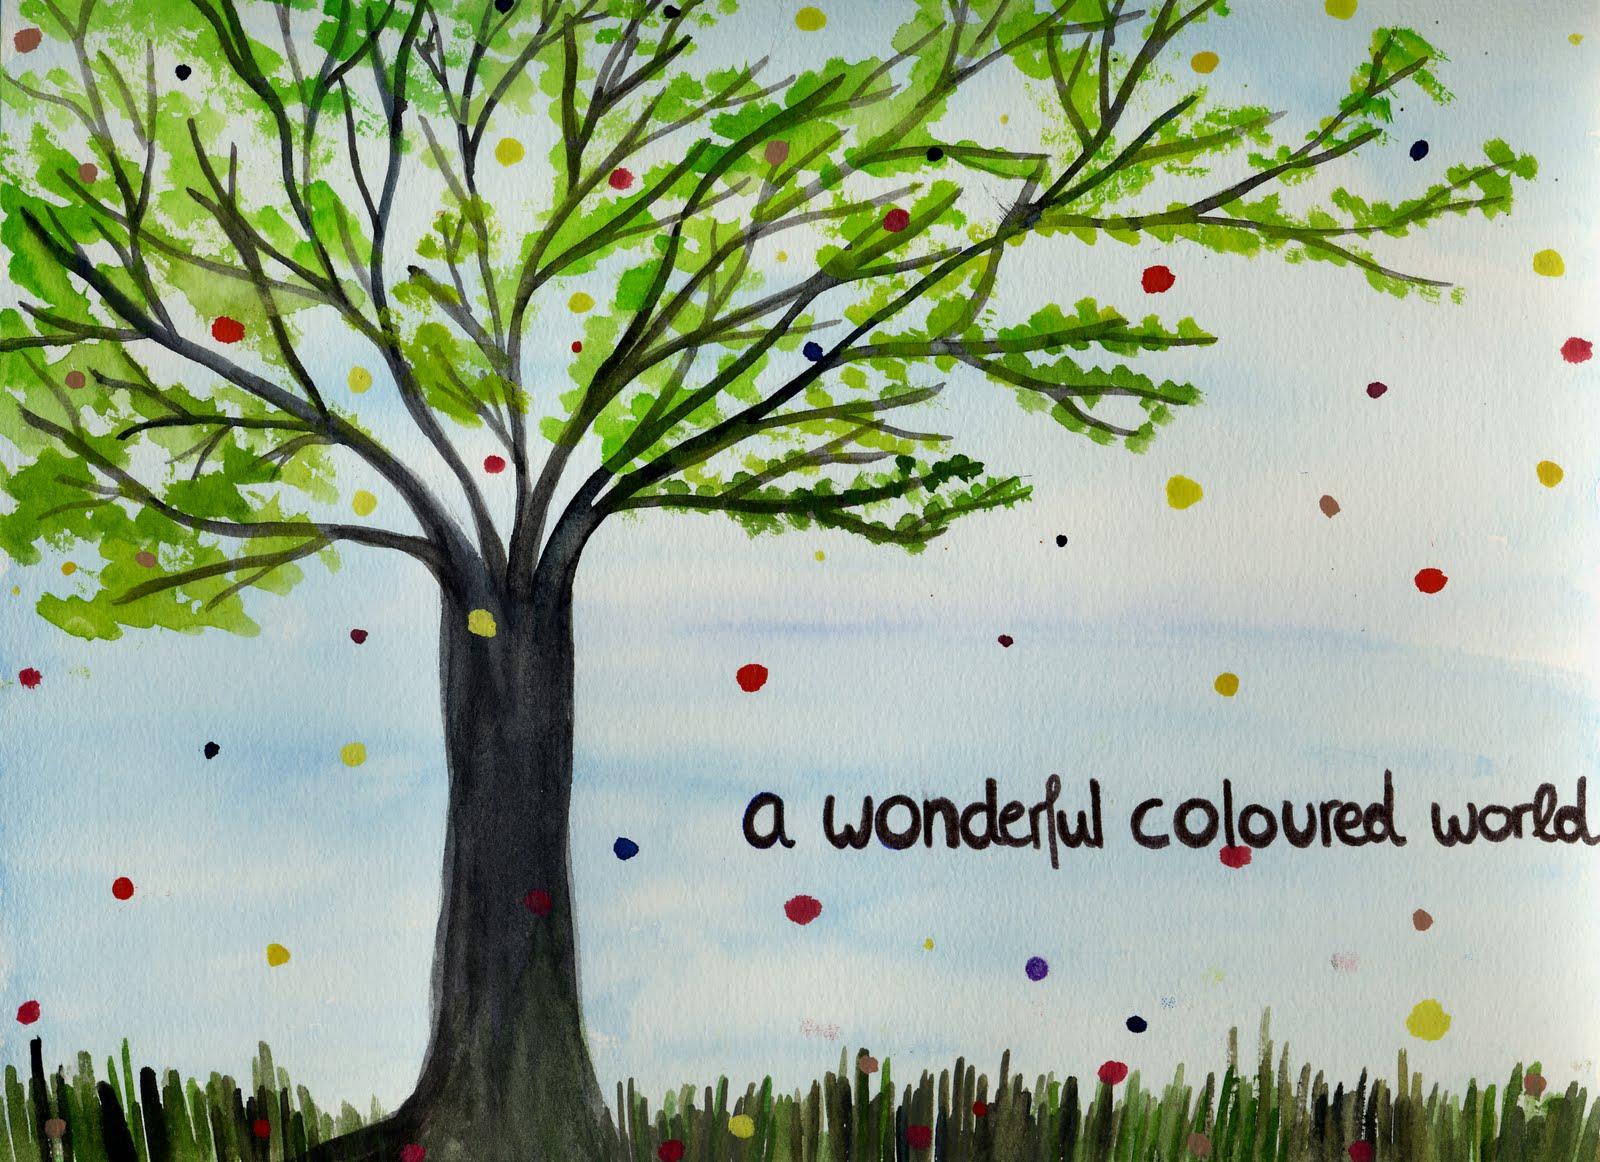 a wonderful coloured world